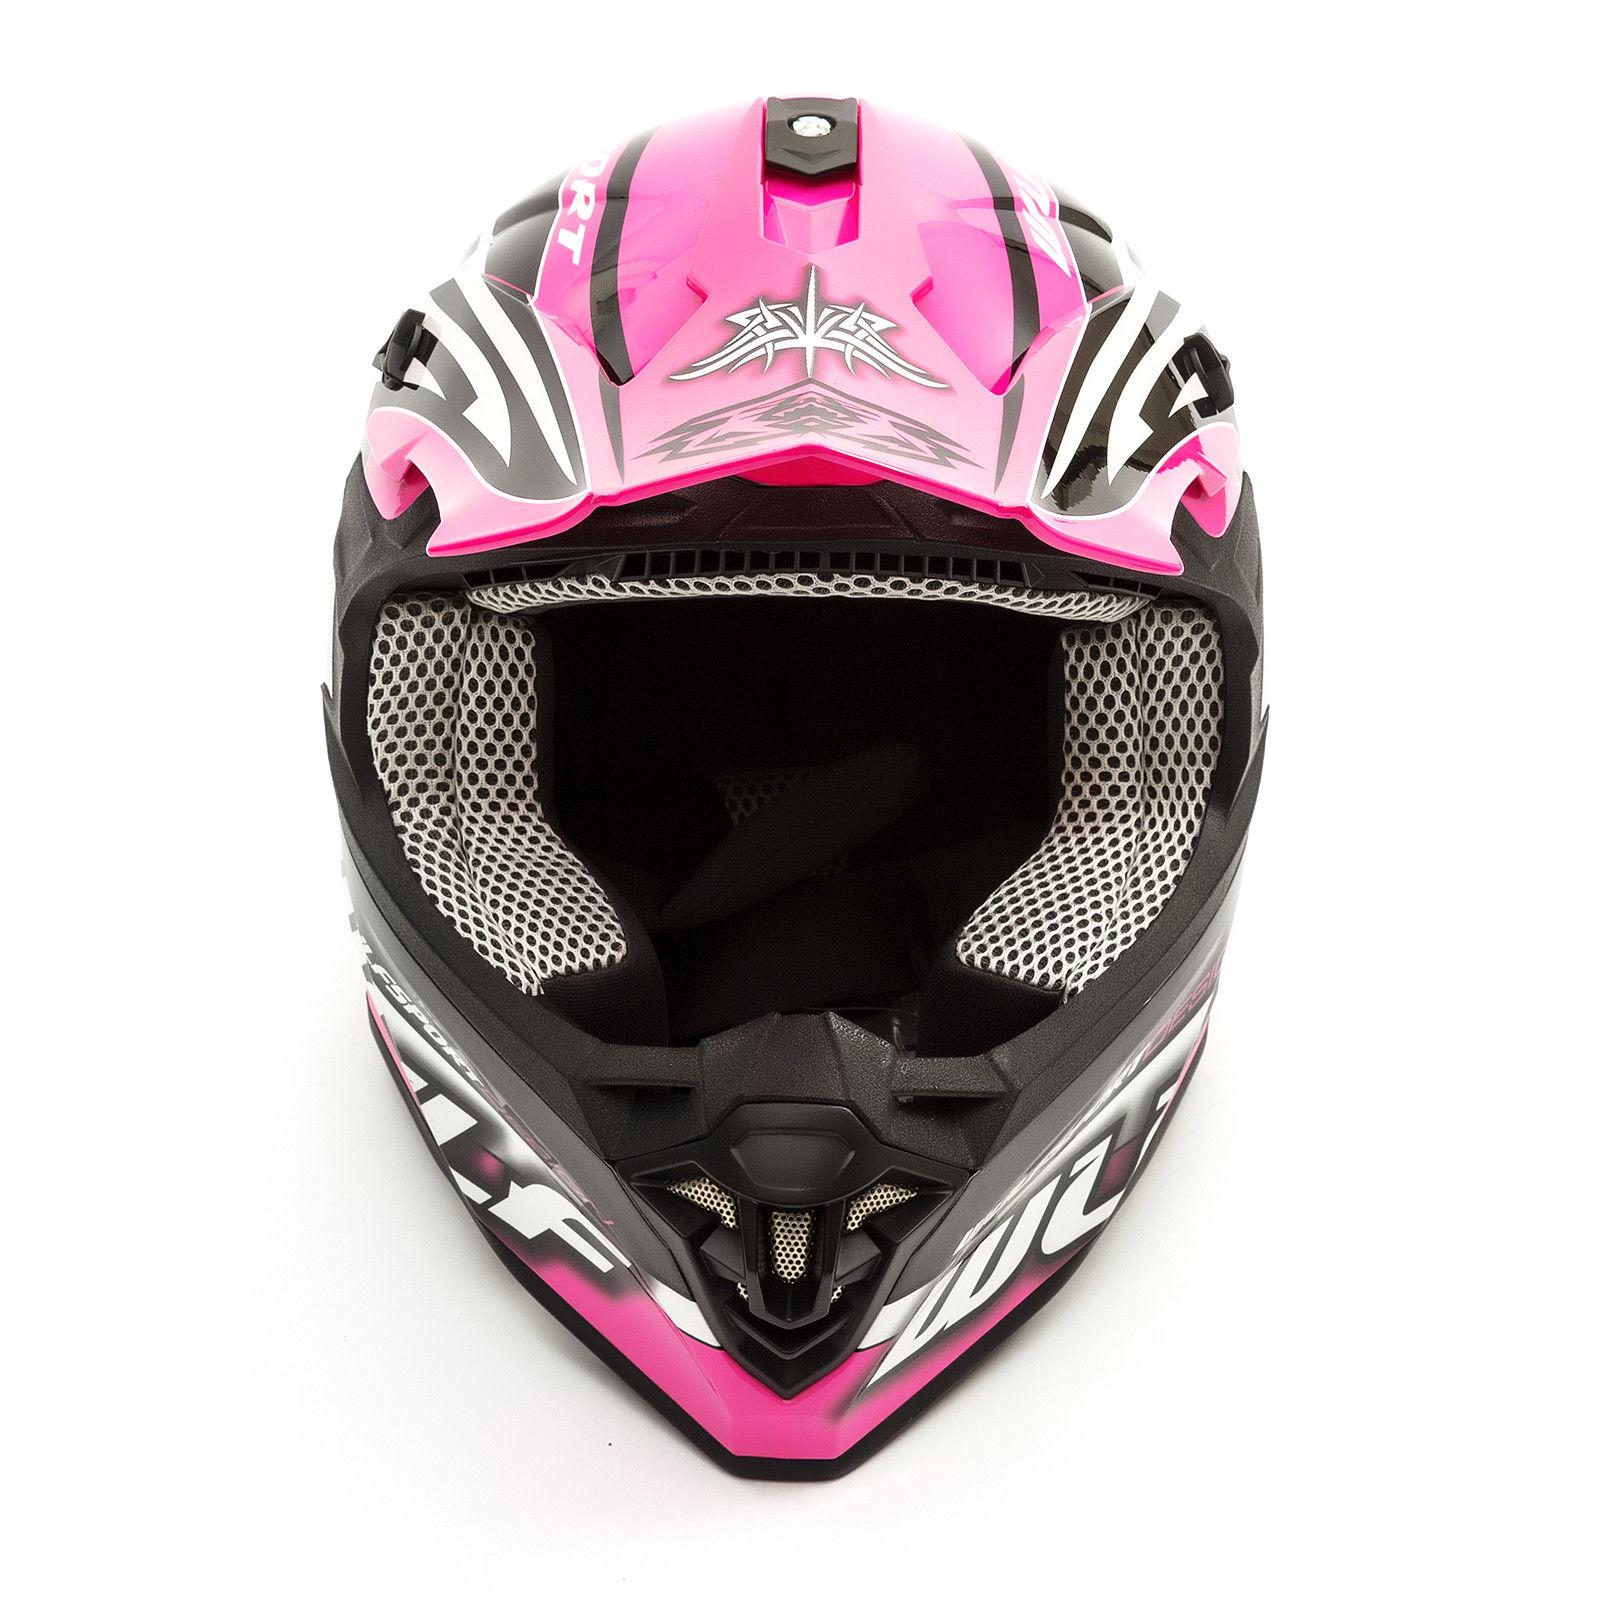 Wulfsport-Adult-Sceptre-Helmets-Motocross-Pitbike-Motorbike-Off-Road-Racing-ATV thumbnail 46